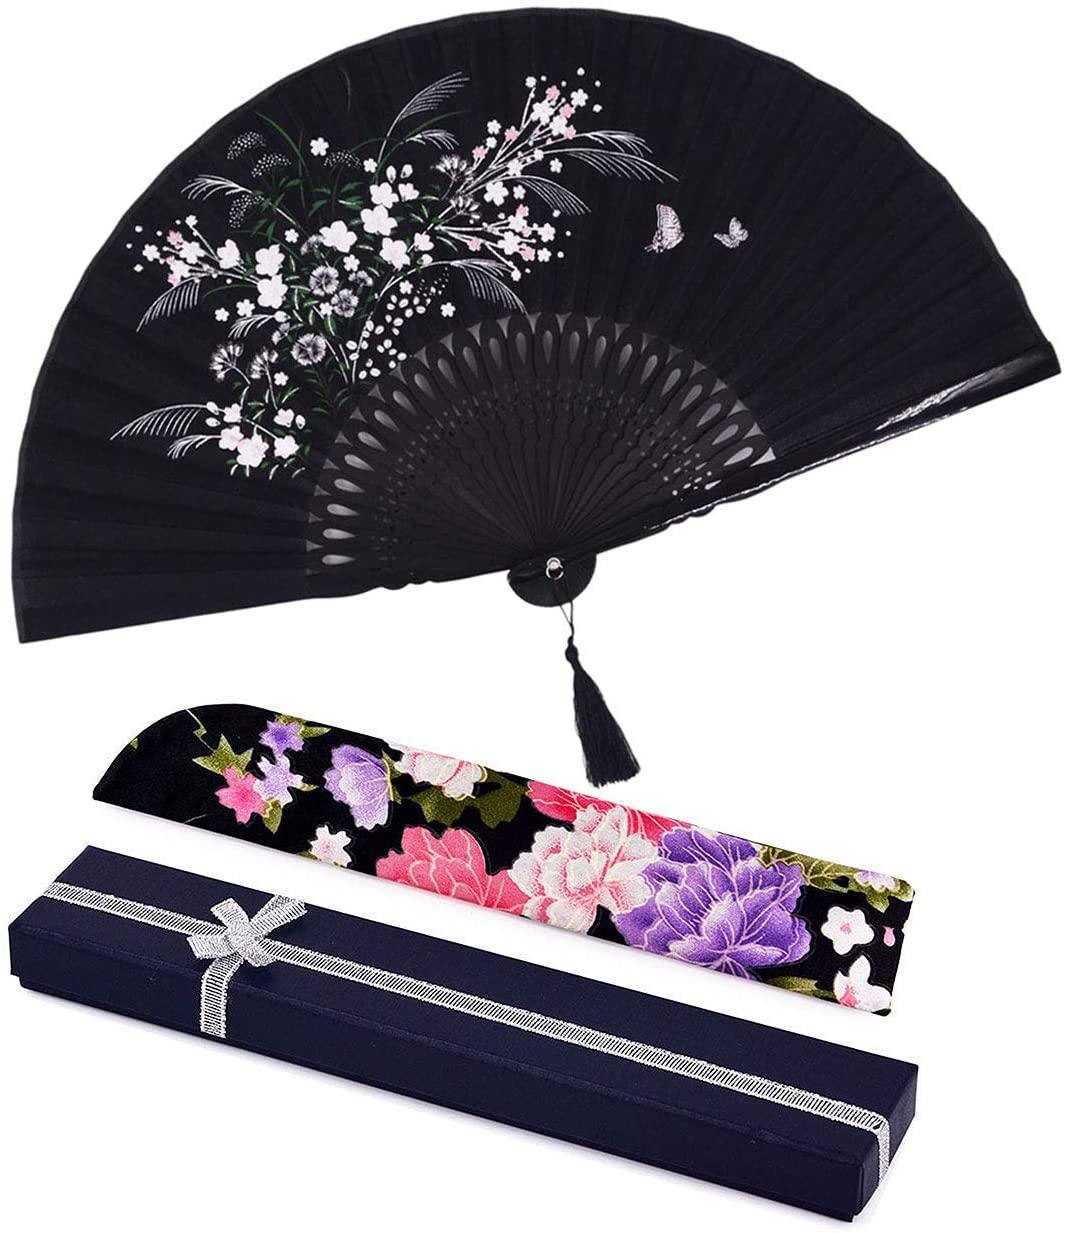 Amajiji Folding Fan, 8.27